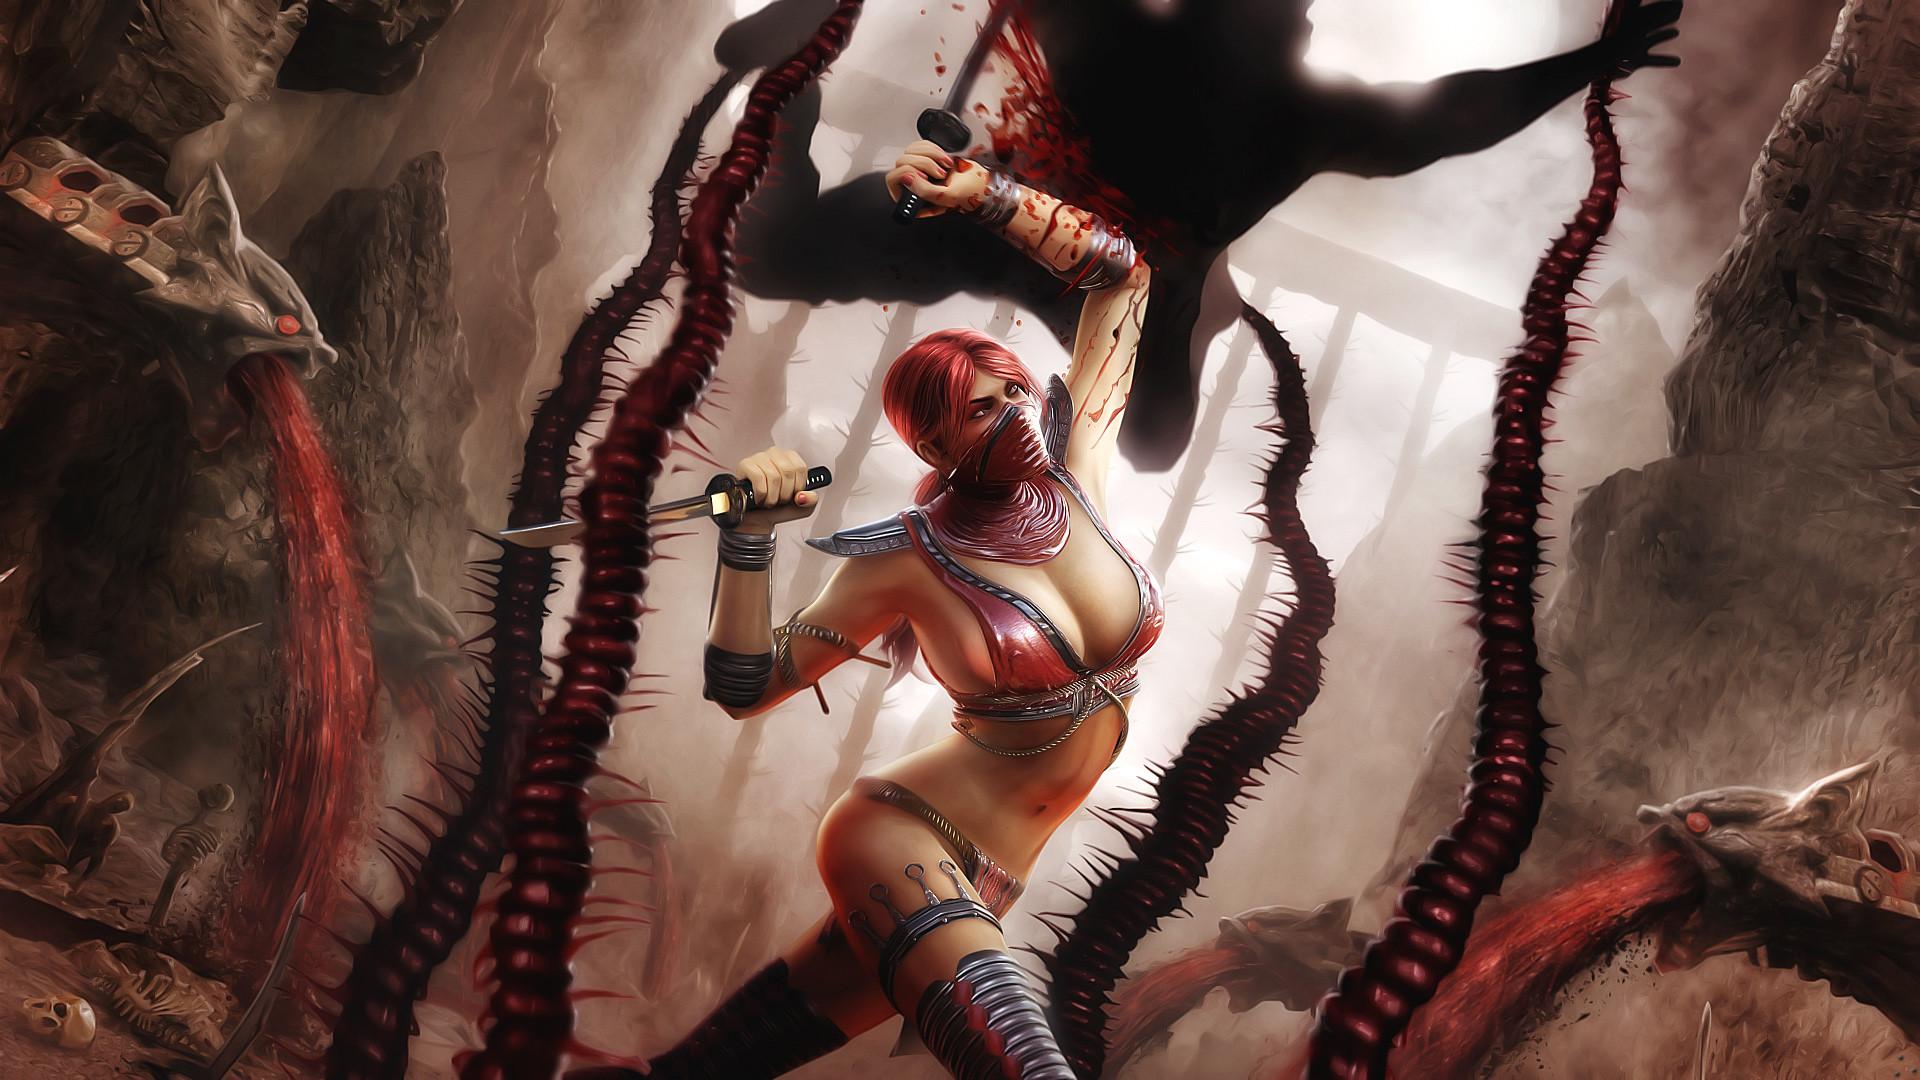 Mortal Kombat HD Wallpapers Backgrounds Wallpaper 1920×1080 Imagenes De Mortal  Kombat Wallpapers (35